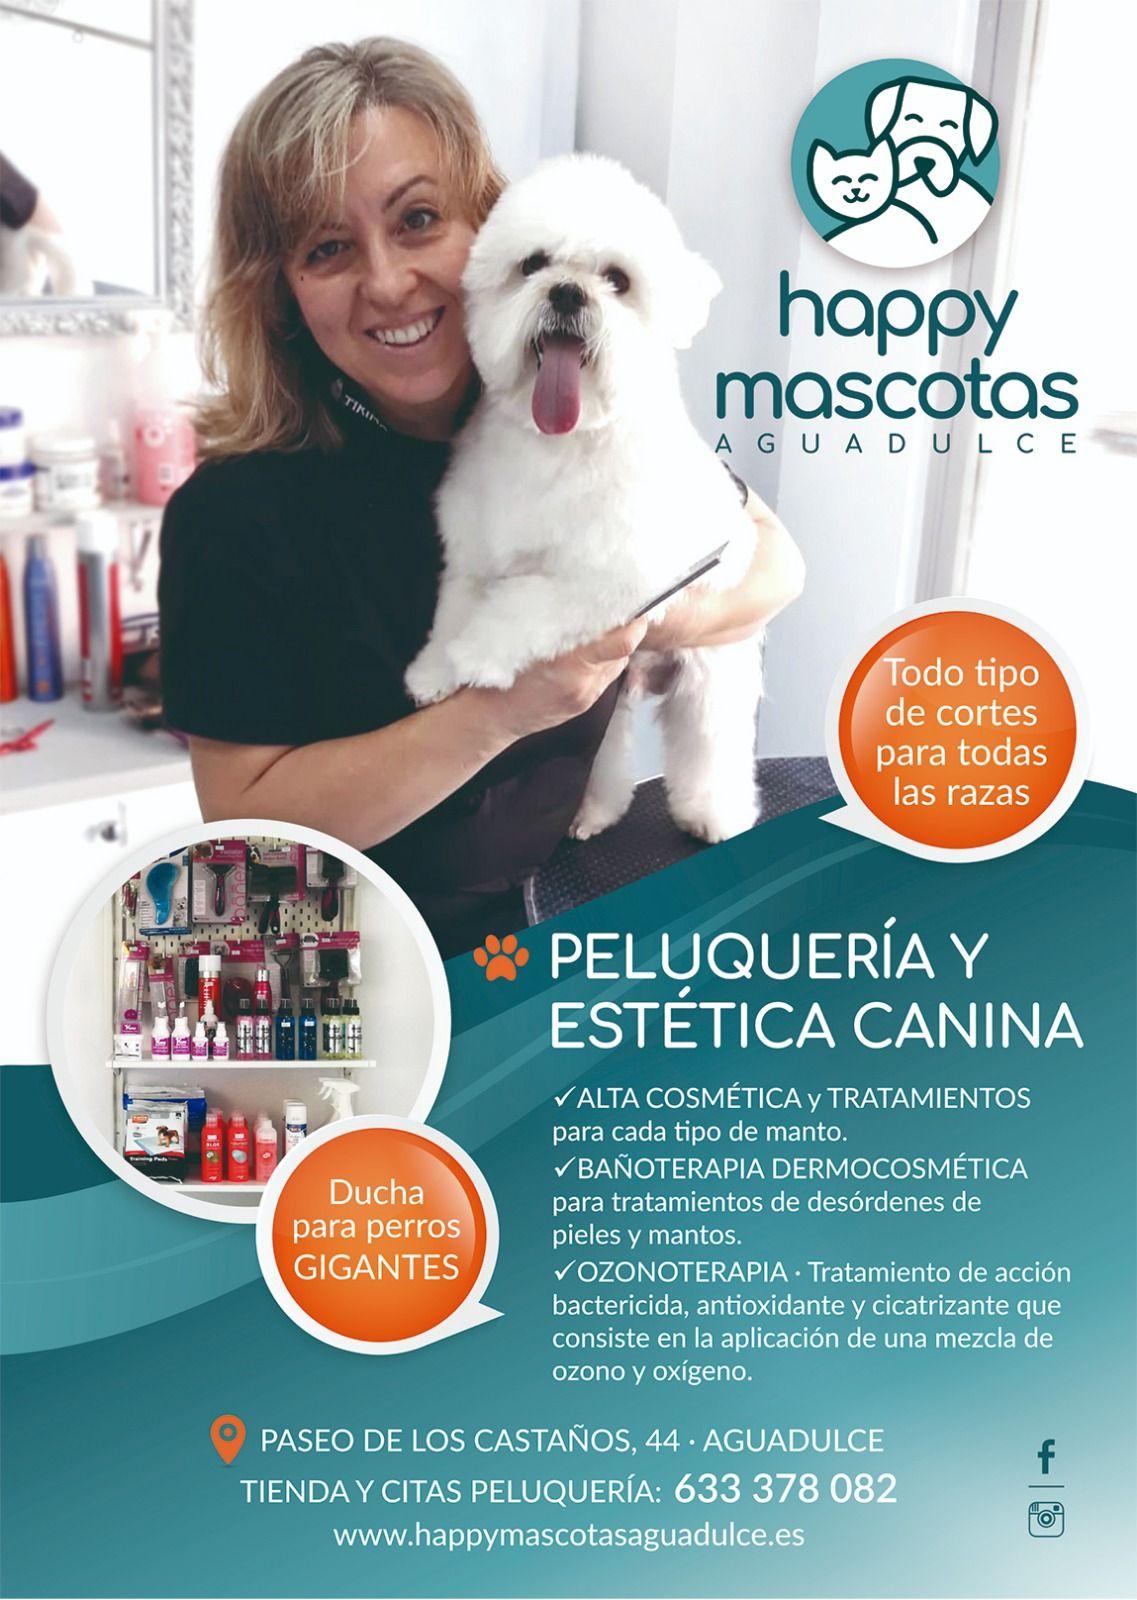 Peluquería canina en Aguadulce